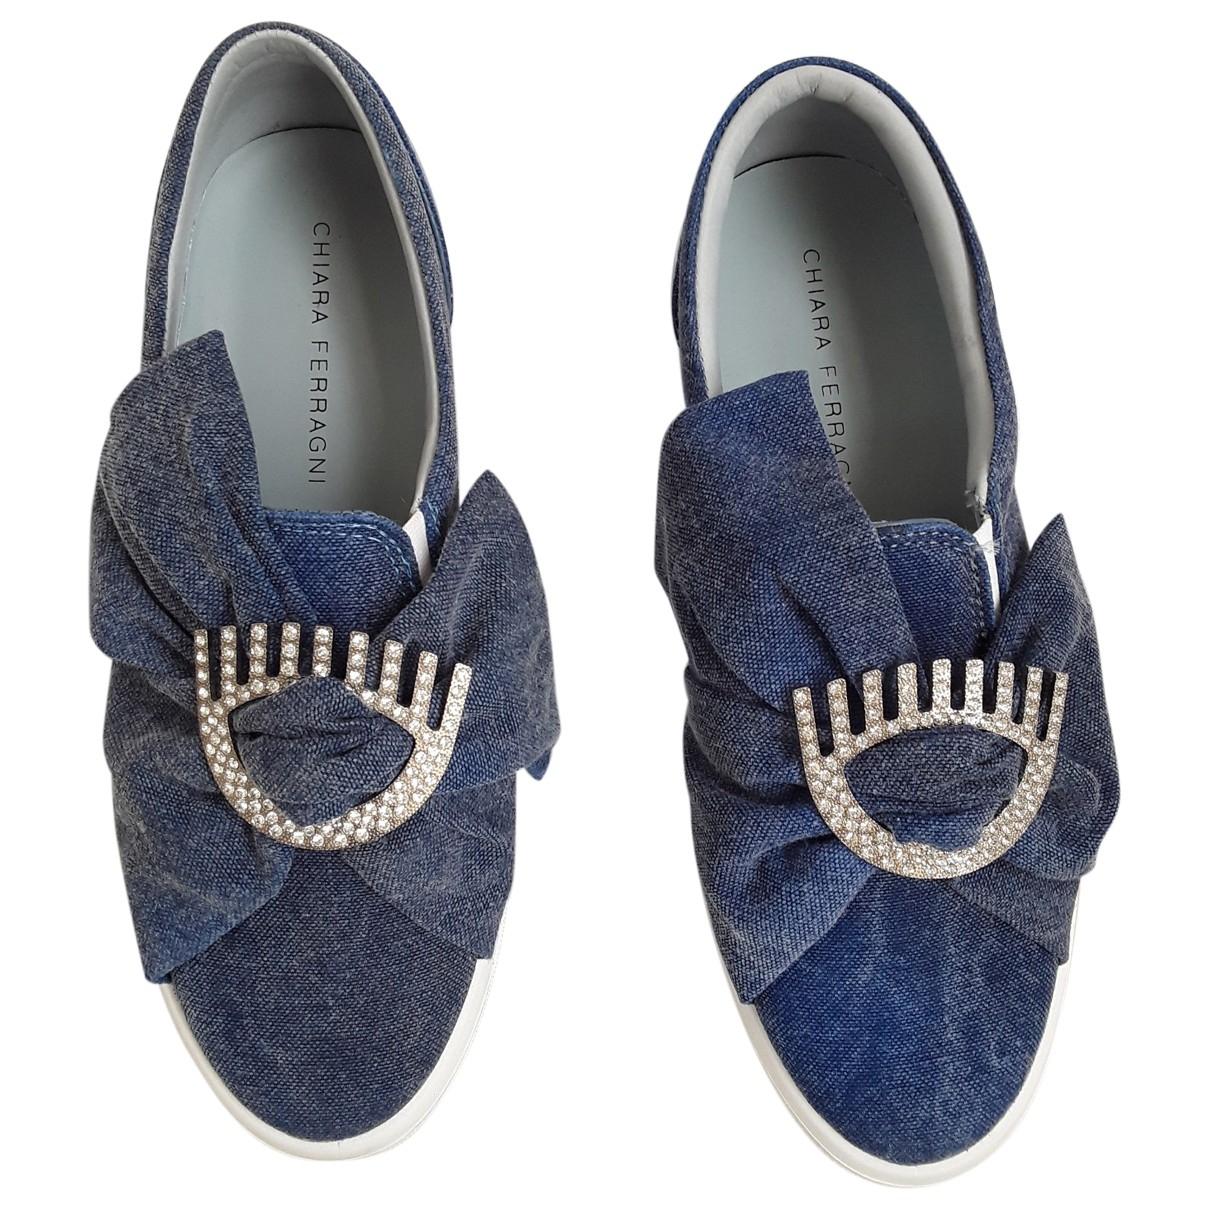 Chiara Ferragni - Baskets   pour femme en toile - bleu